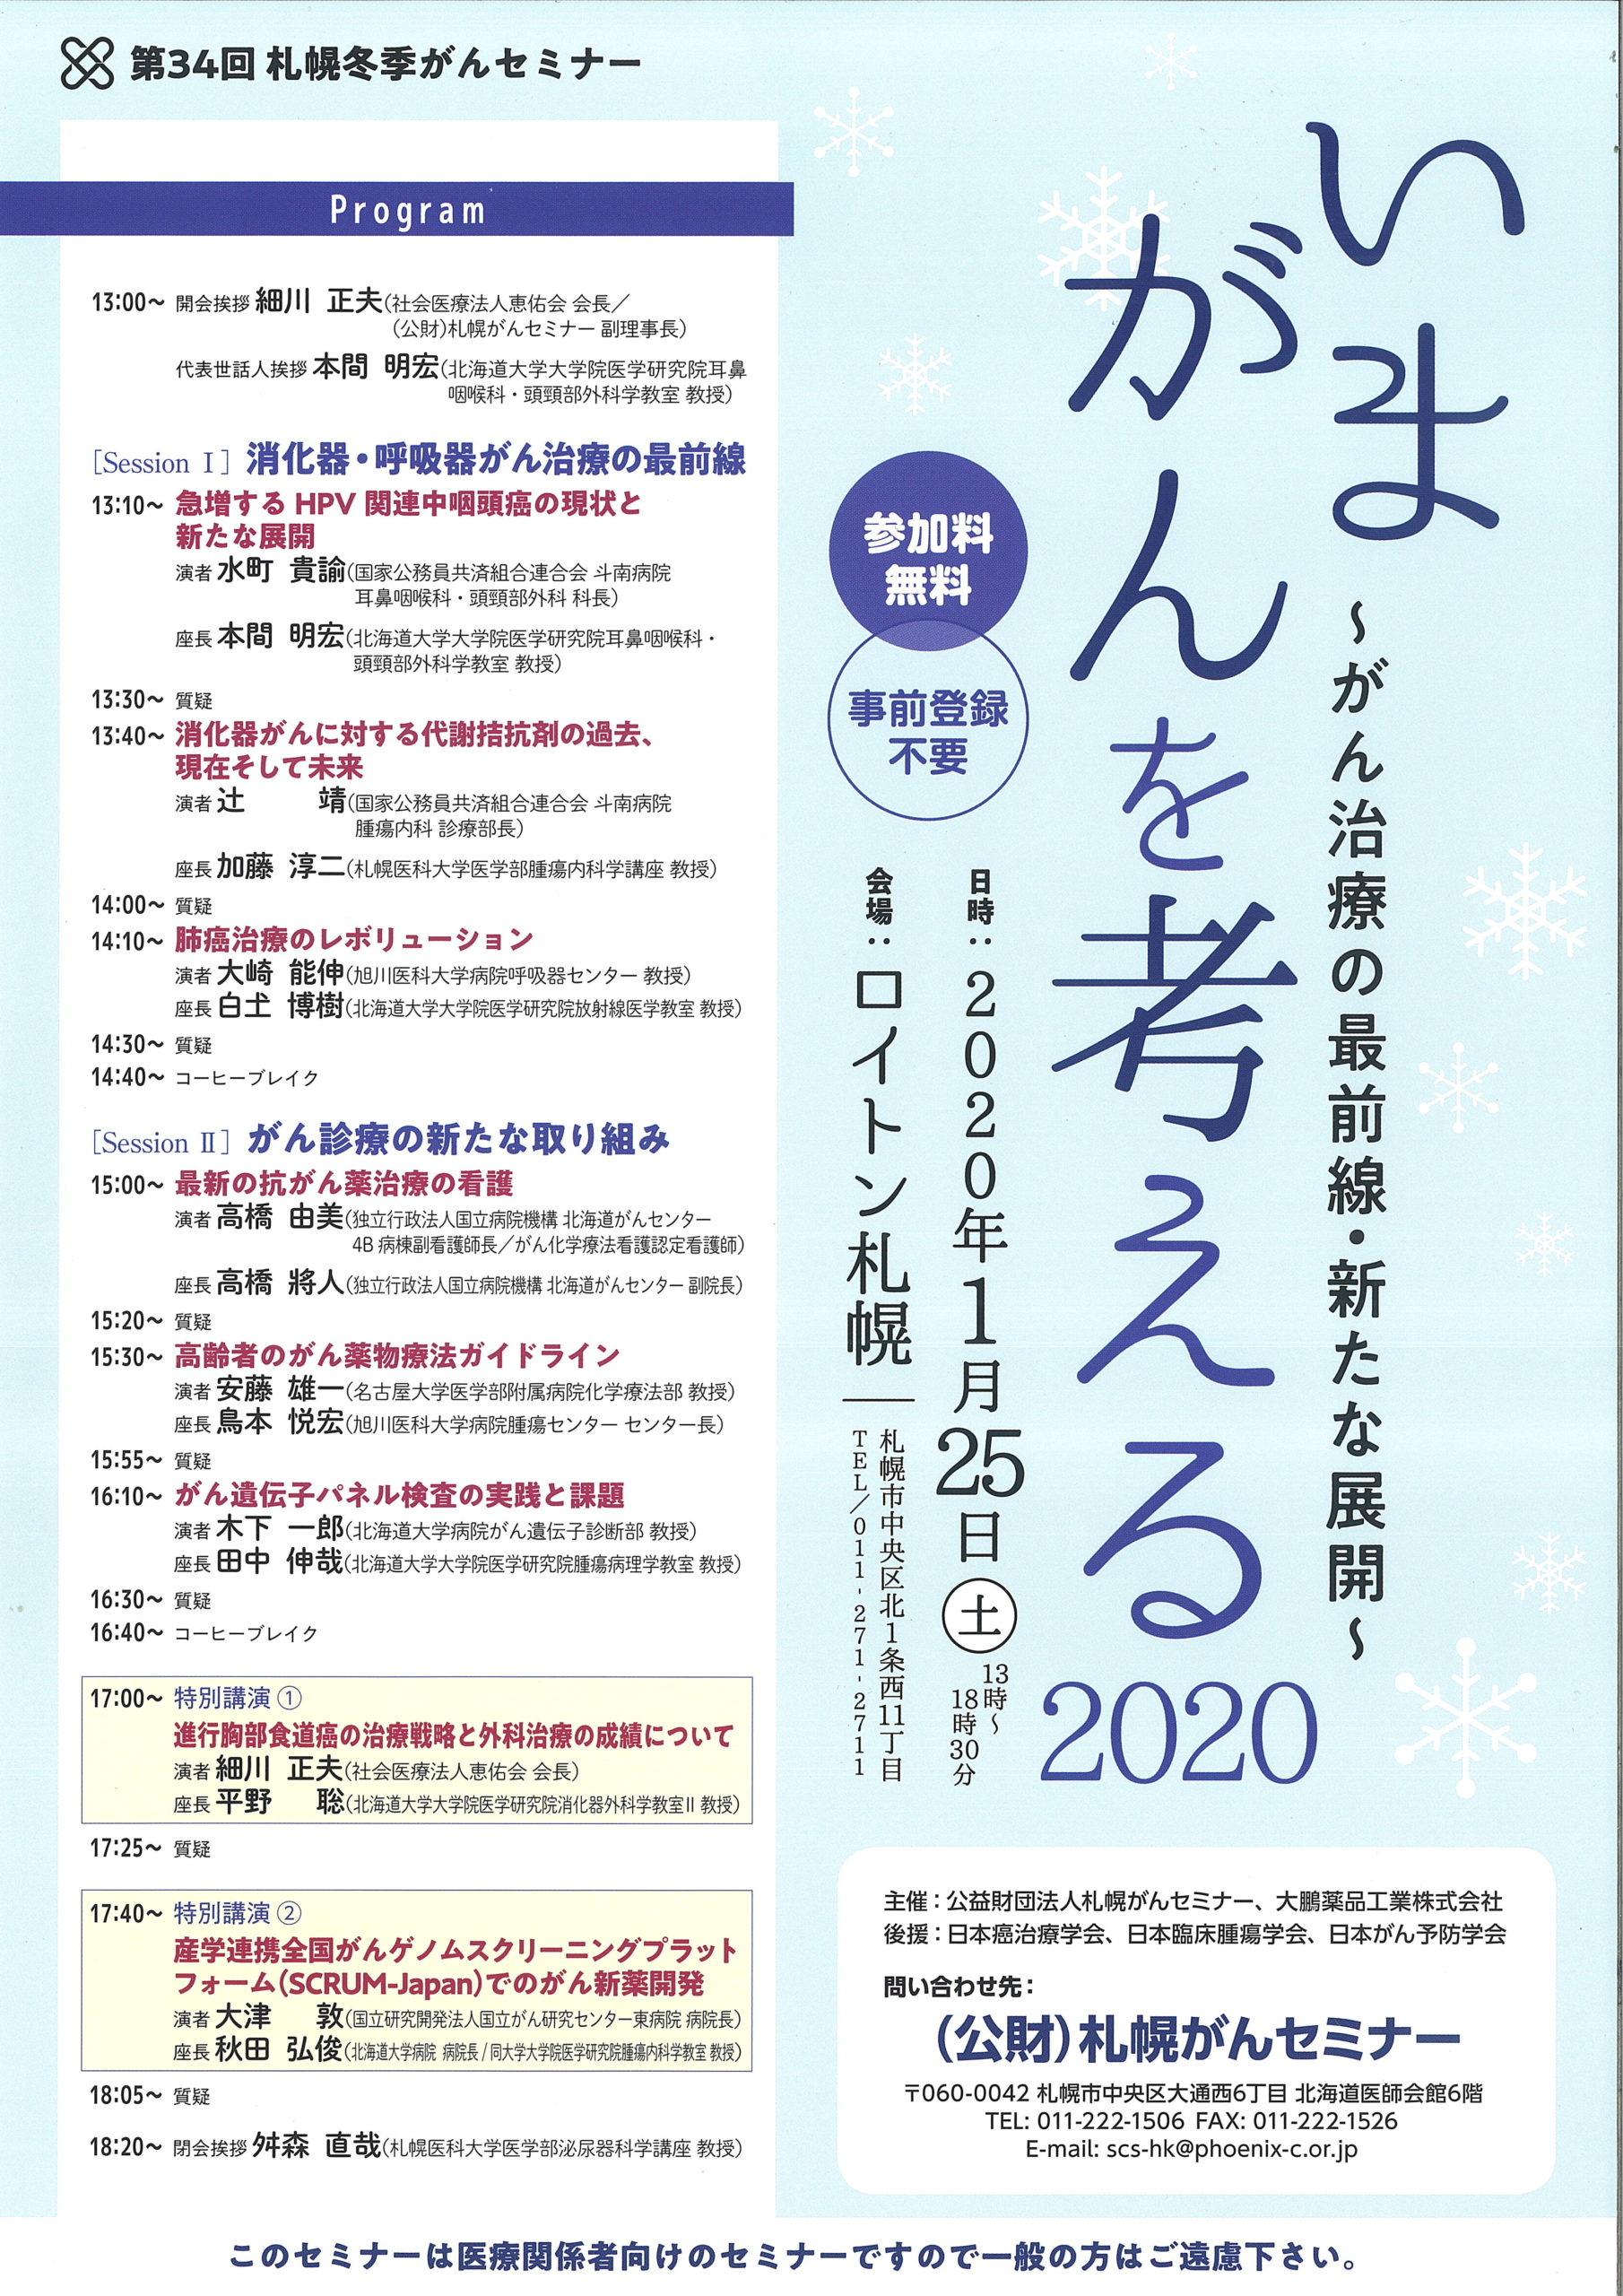 WinterSemina2020